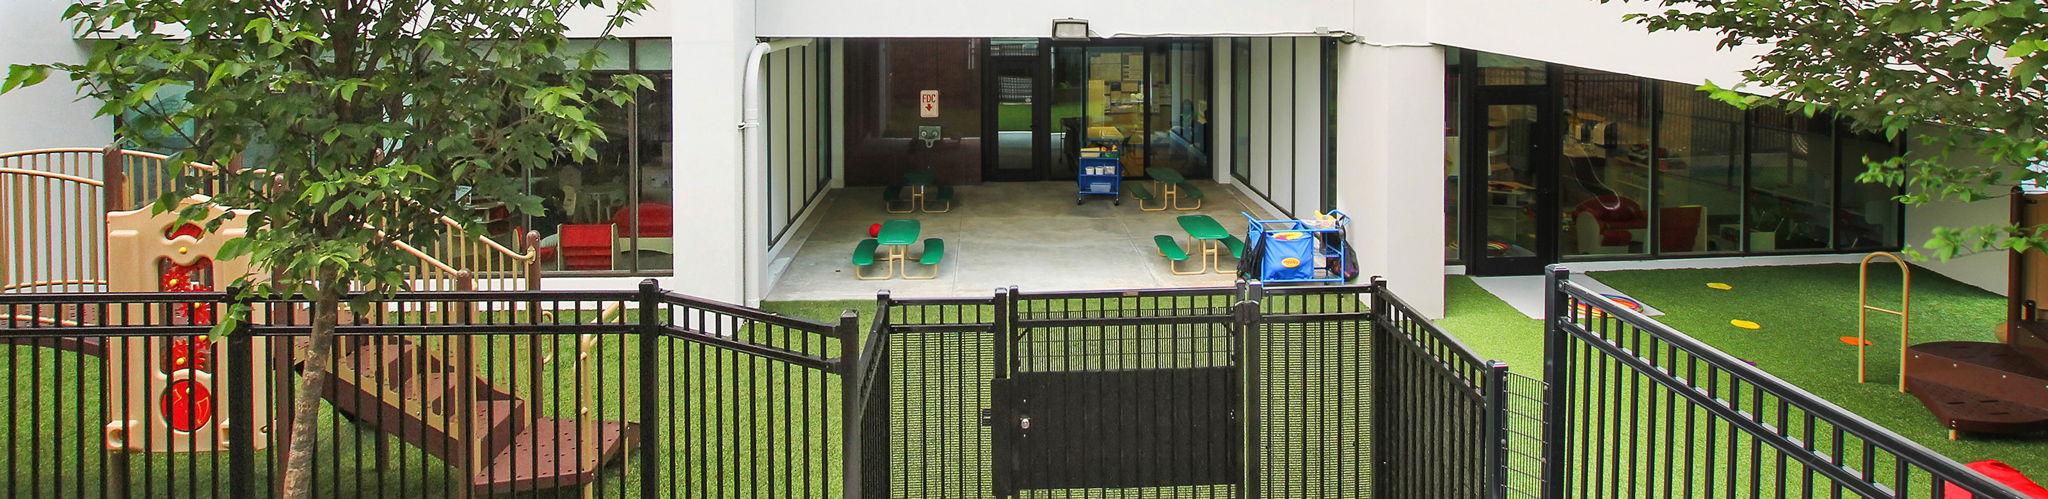 Children play area of the Primrose School of Buckhead